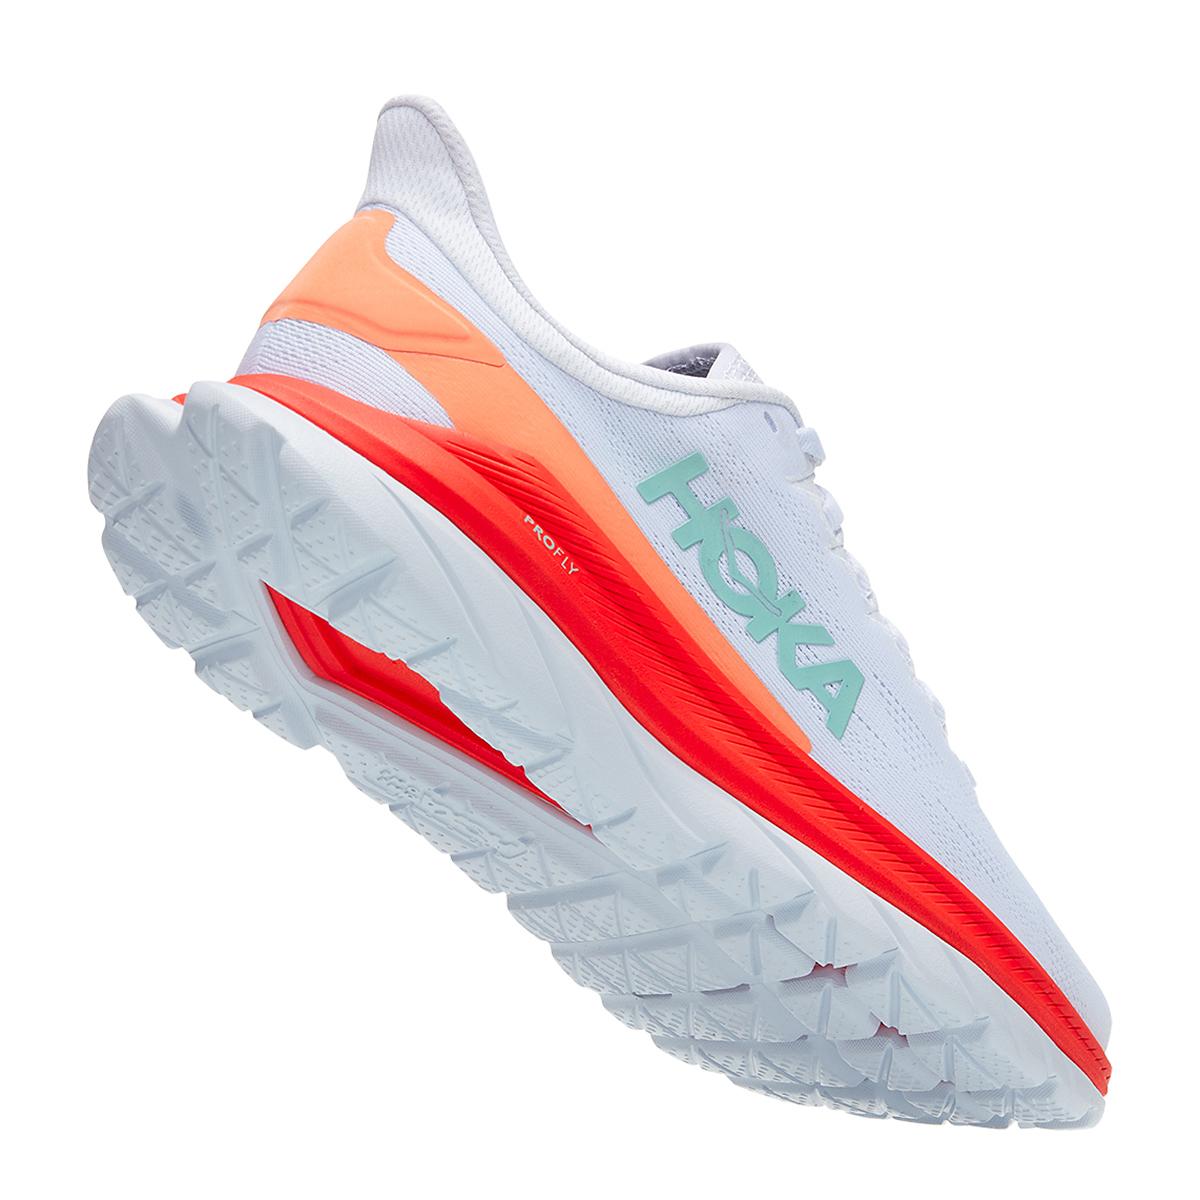 Women's Hoka One One Mach 4 Running Shoe - Color: White/Fiesta - Size: 5 - Width: Regular, White/Fiesta, large, image 3